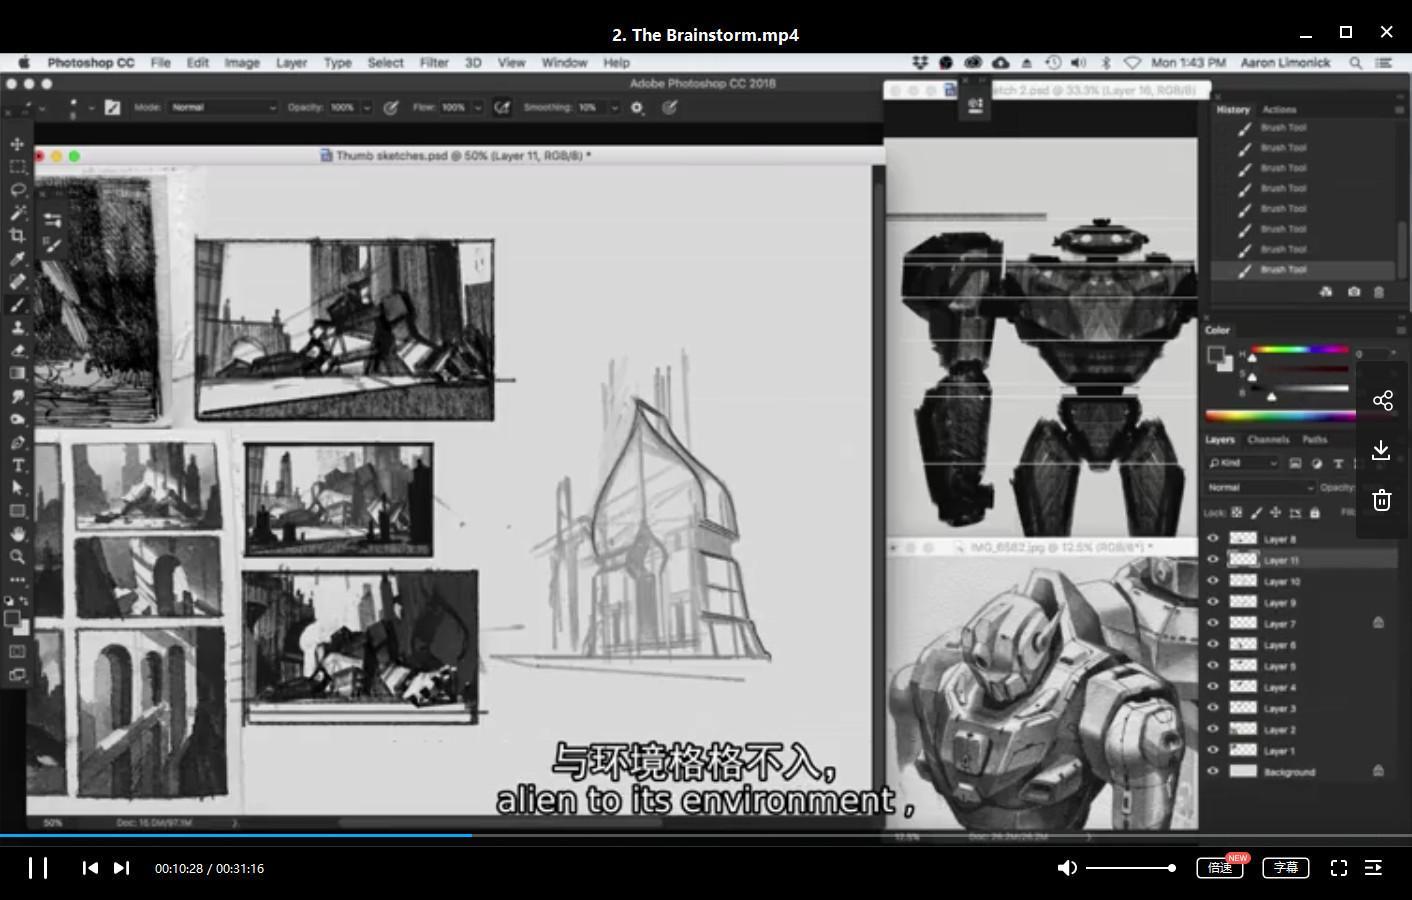 3D教程-Artstation 2018大师班视频教程十部合集 中文字幕 35.88GB(4)